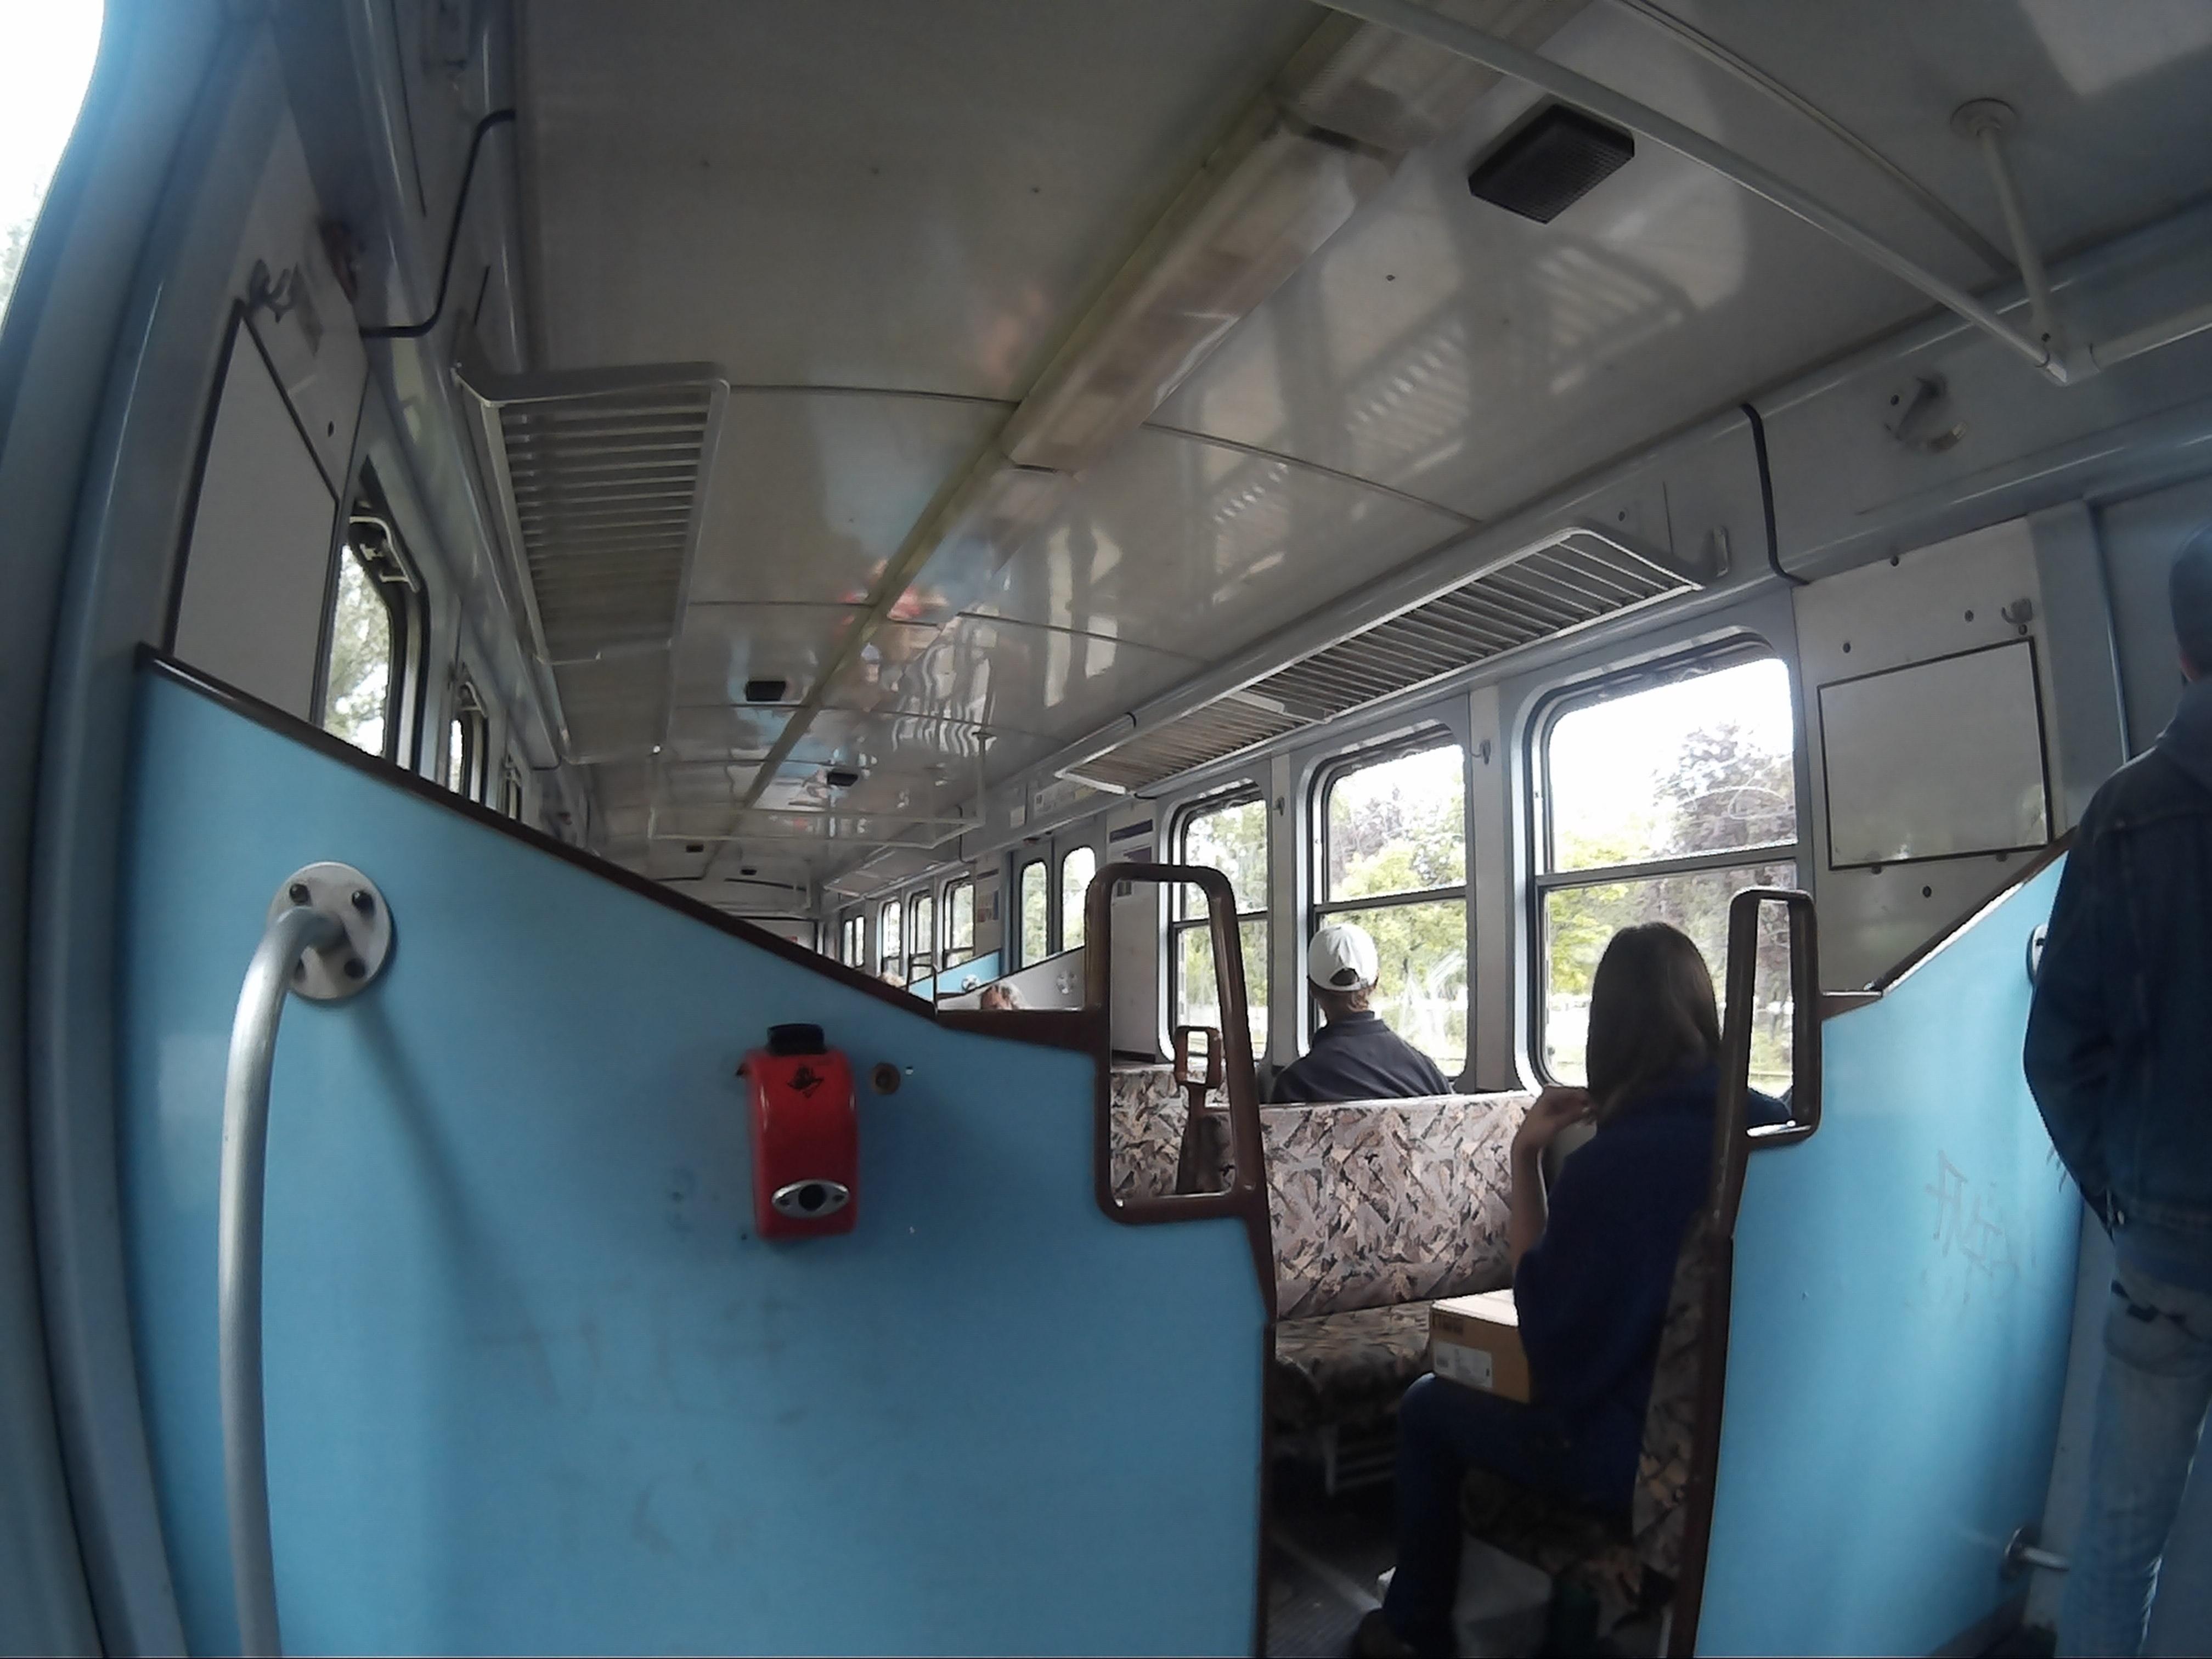 SJ4000.Sport.Camera).GoPro.Clone).-.Test.Pic___By.JunkieeeBoy_02.JPG